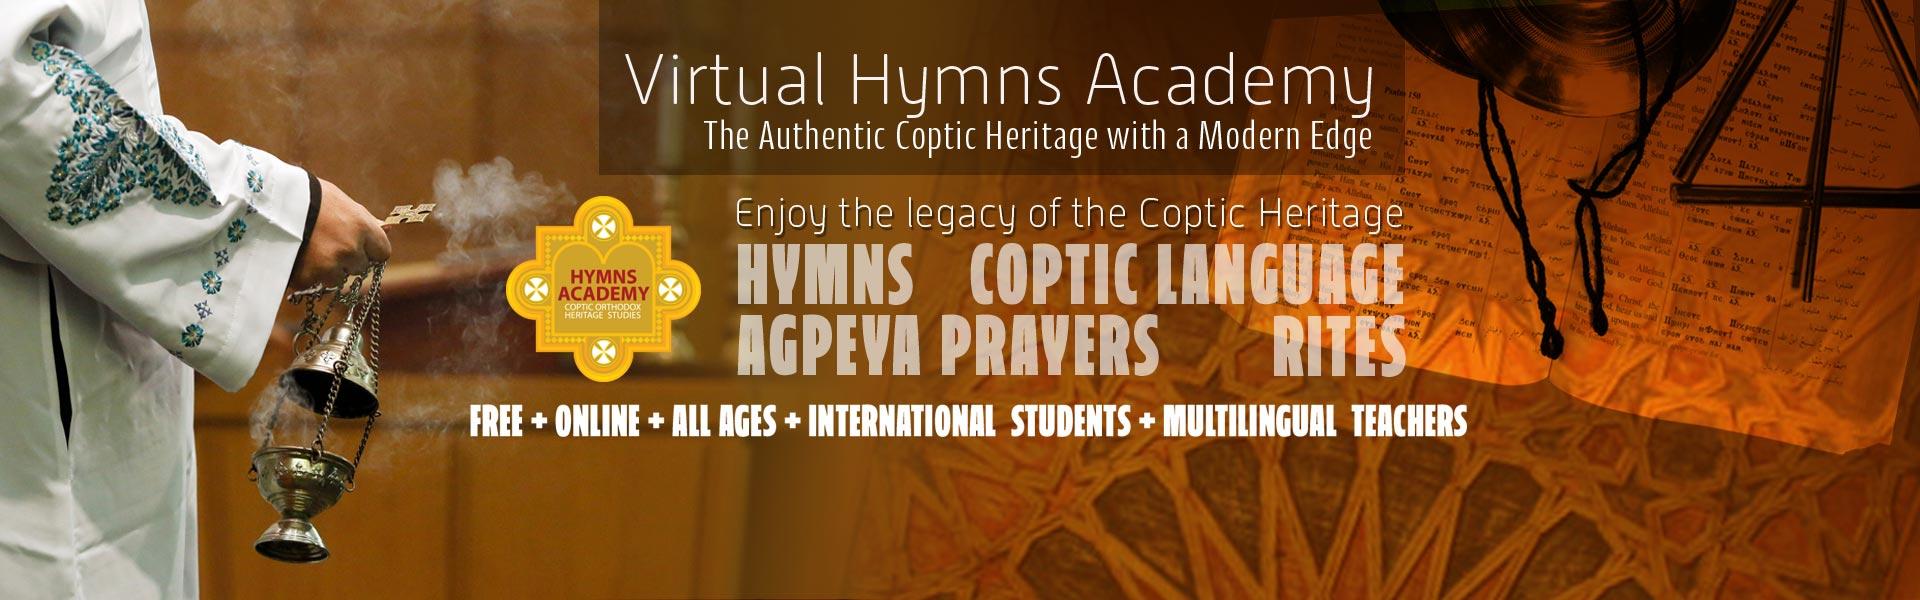 Hymns Academy - ECCOPTS